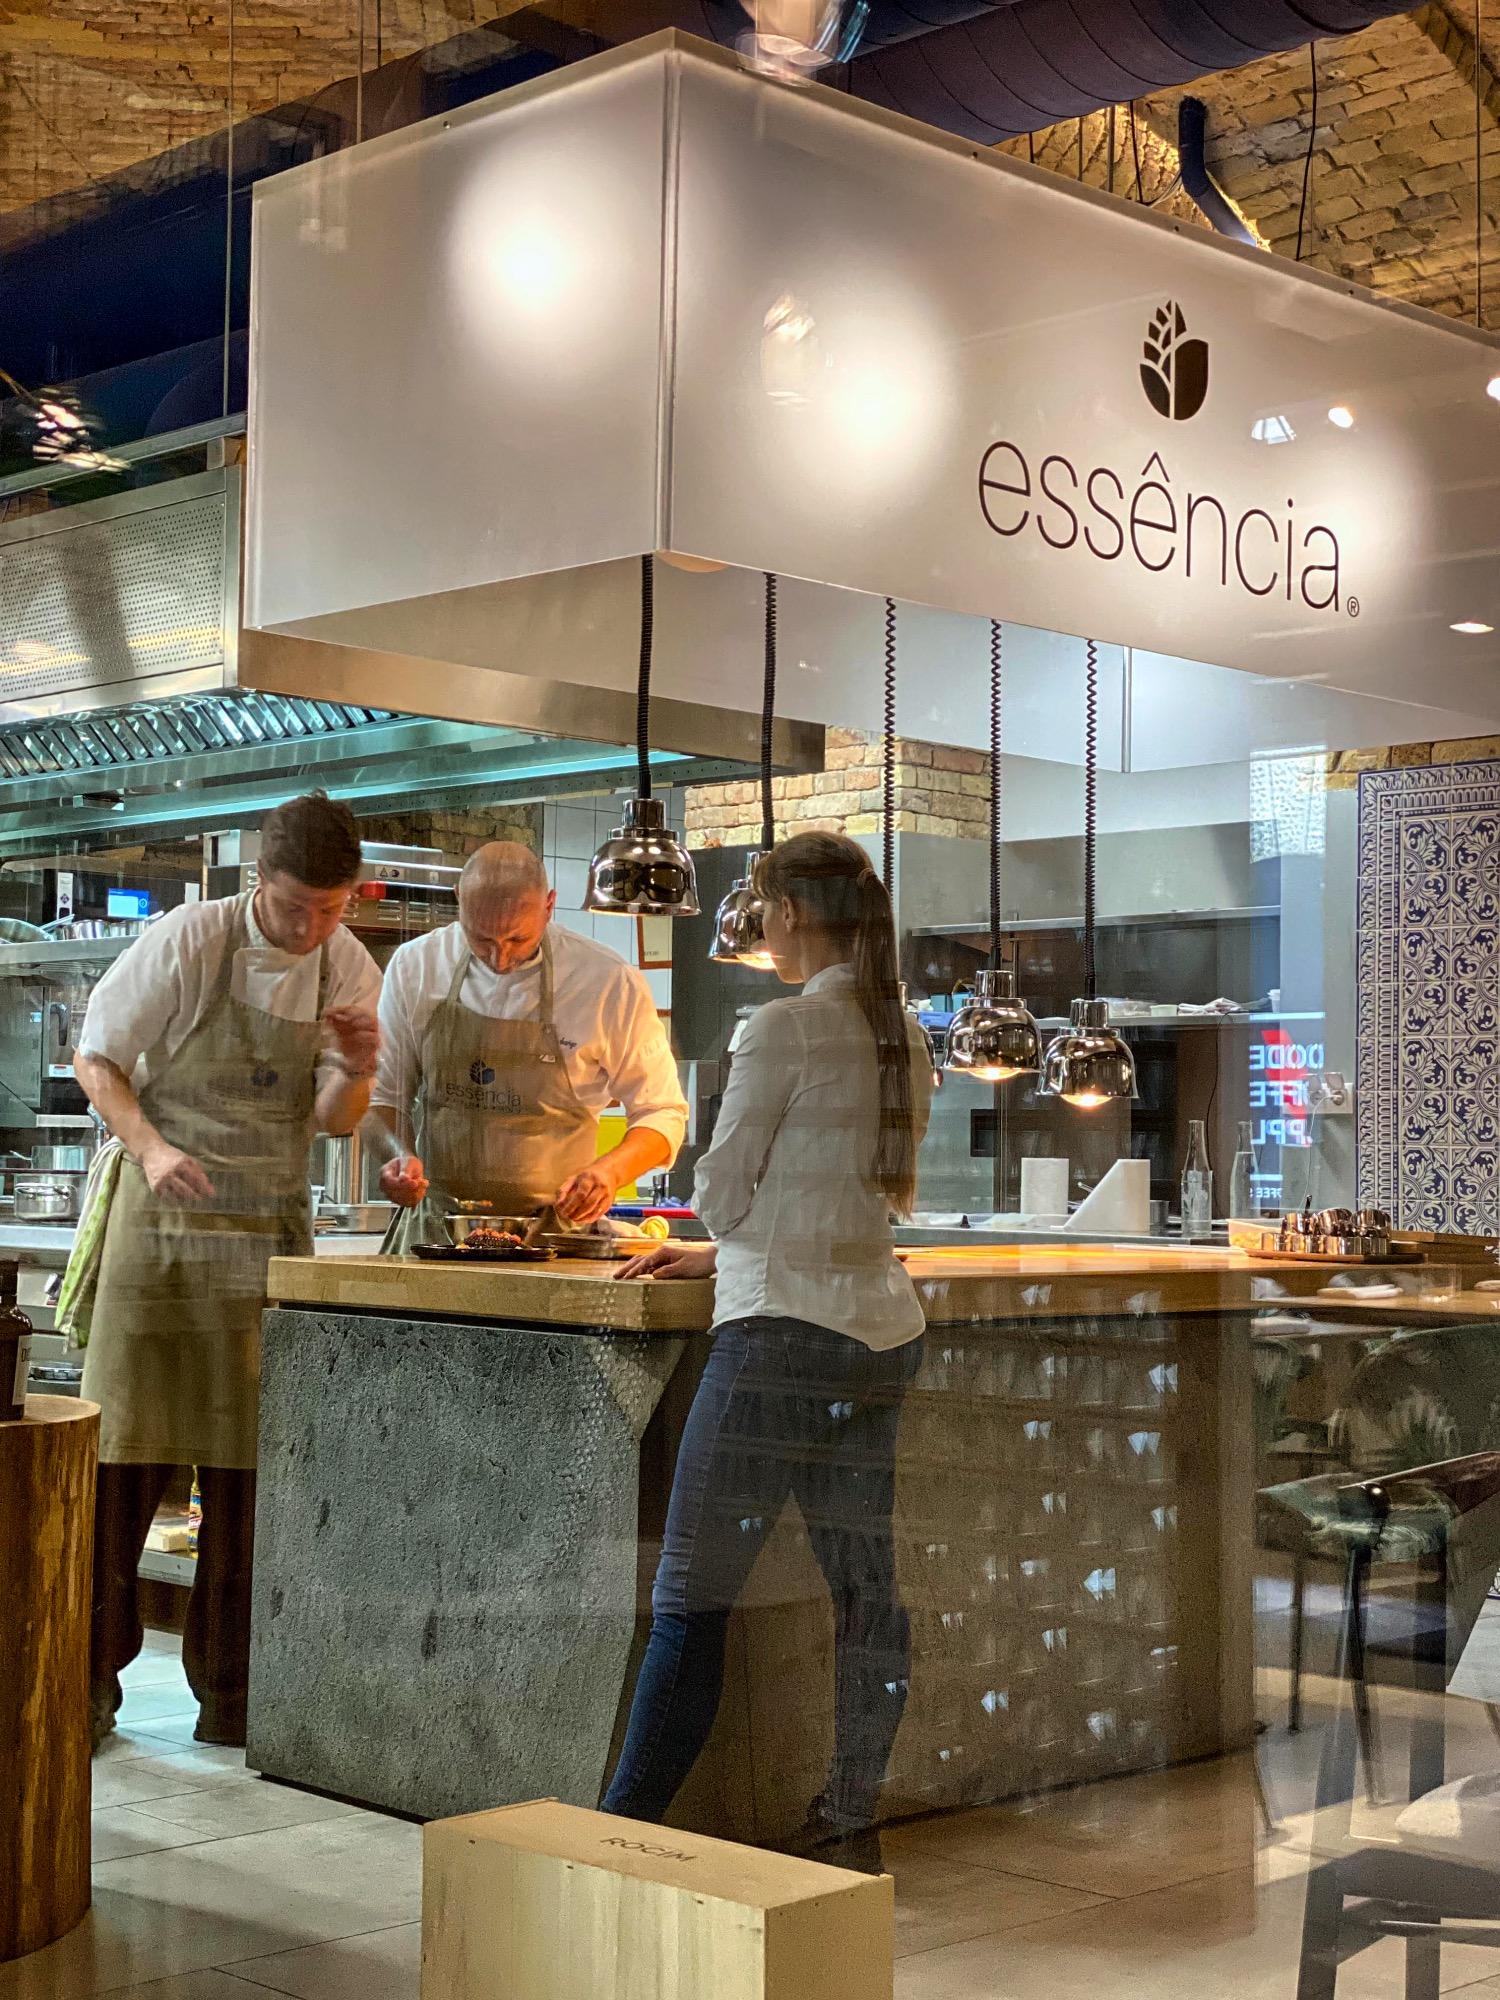 img_5990_essencia_tiago_michelin_budapest_restaurant_jokuti_vilagevo.jpeg